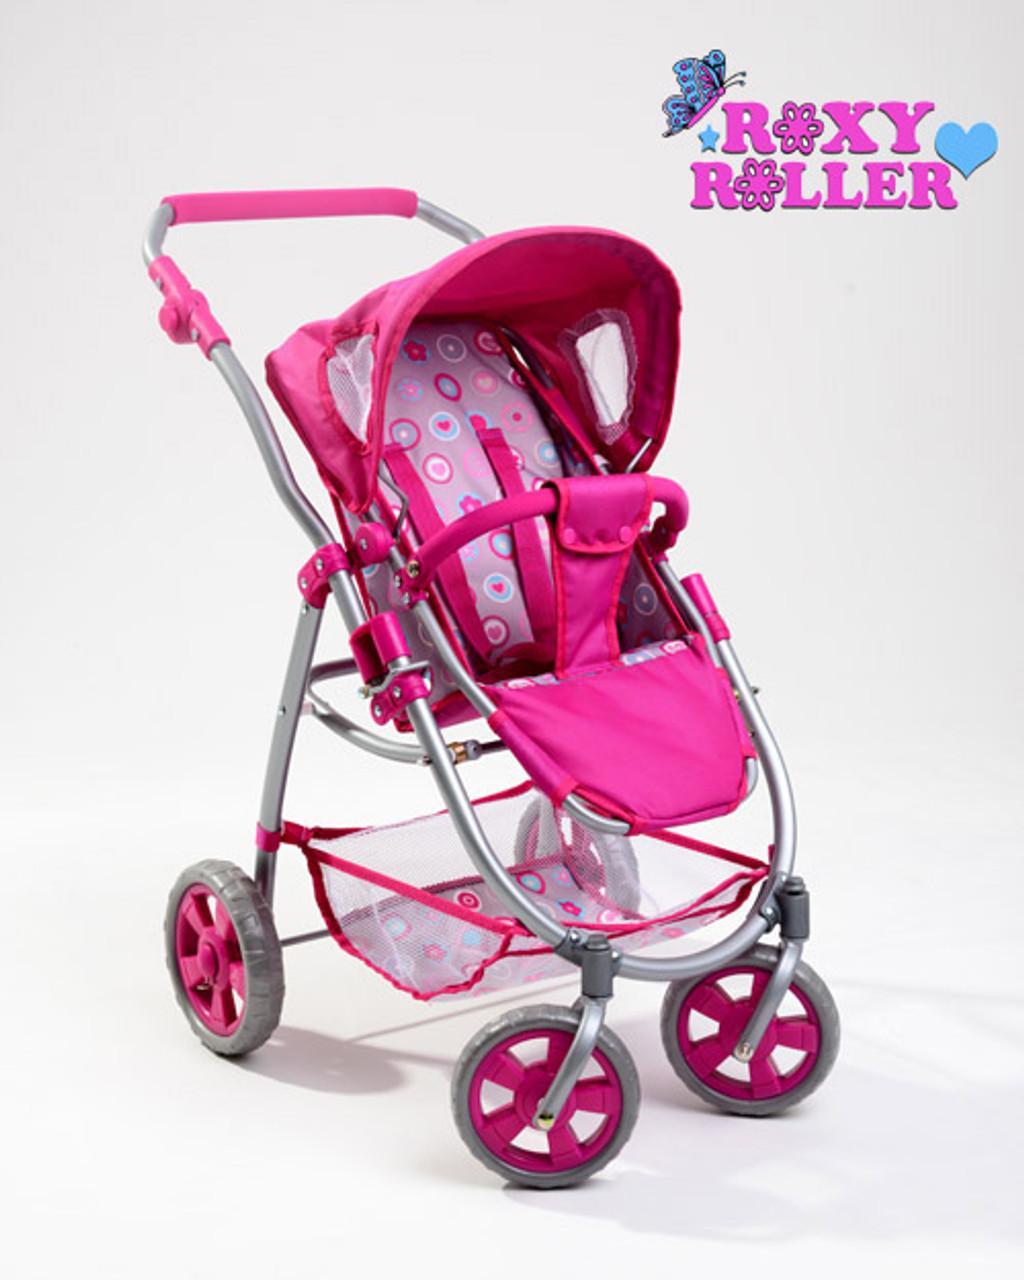 Kids 3 in 1 Roxy Roller Car Seat Pram Pushchair Doll Stroller